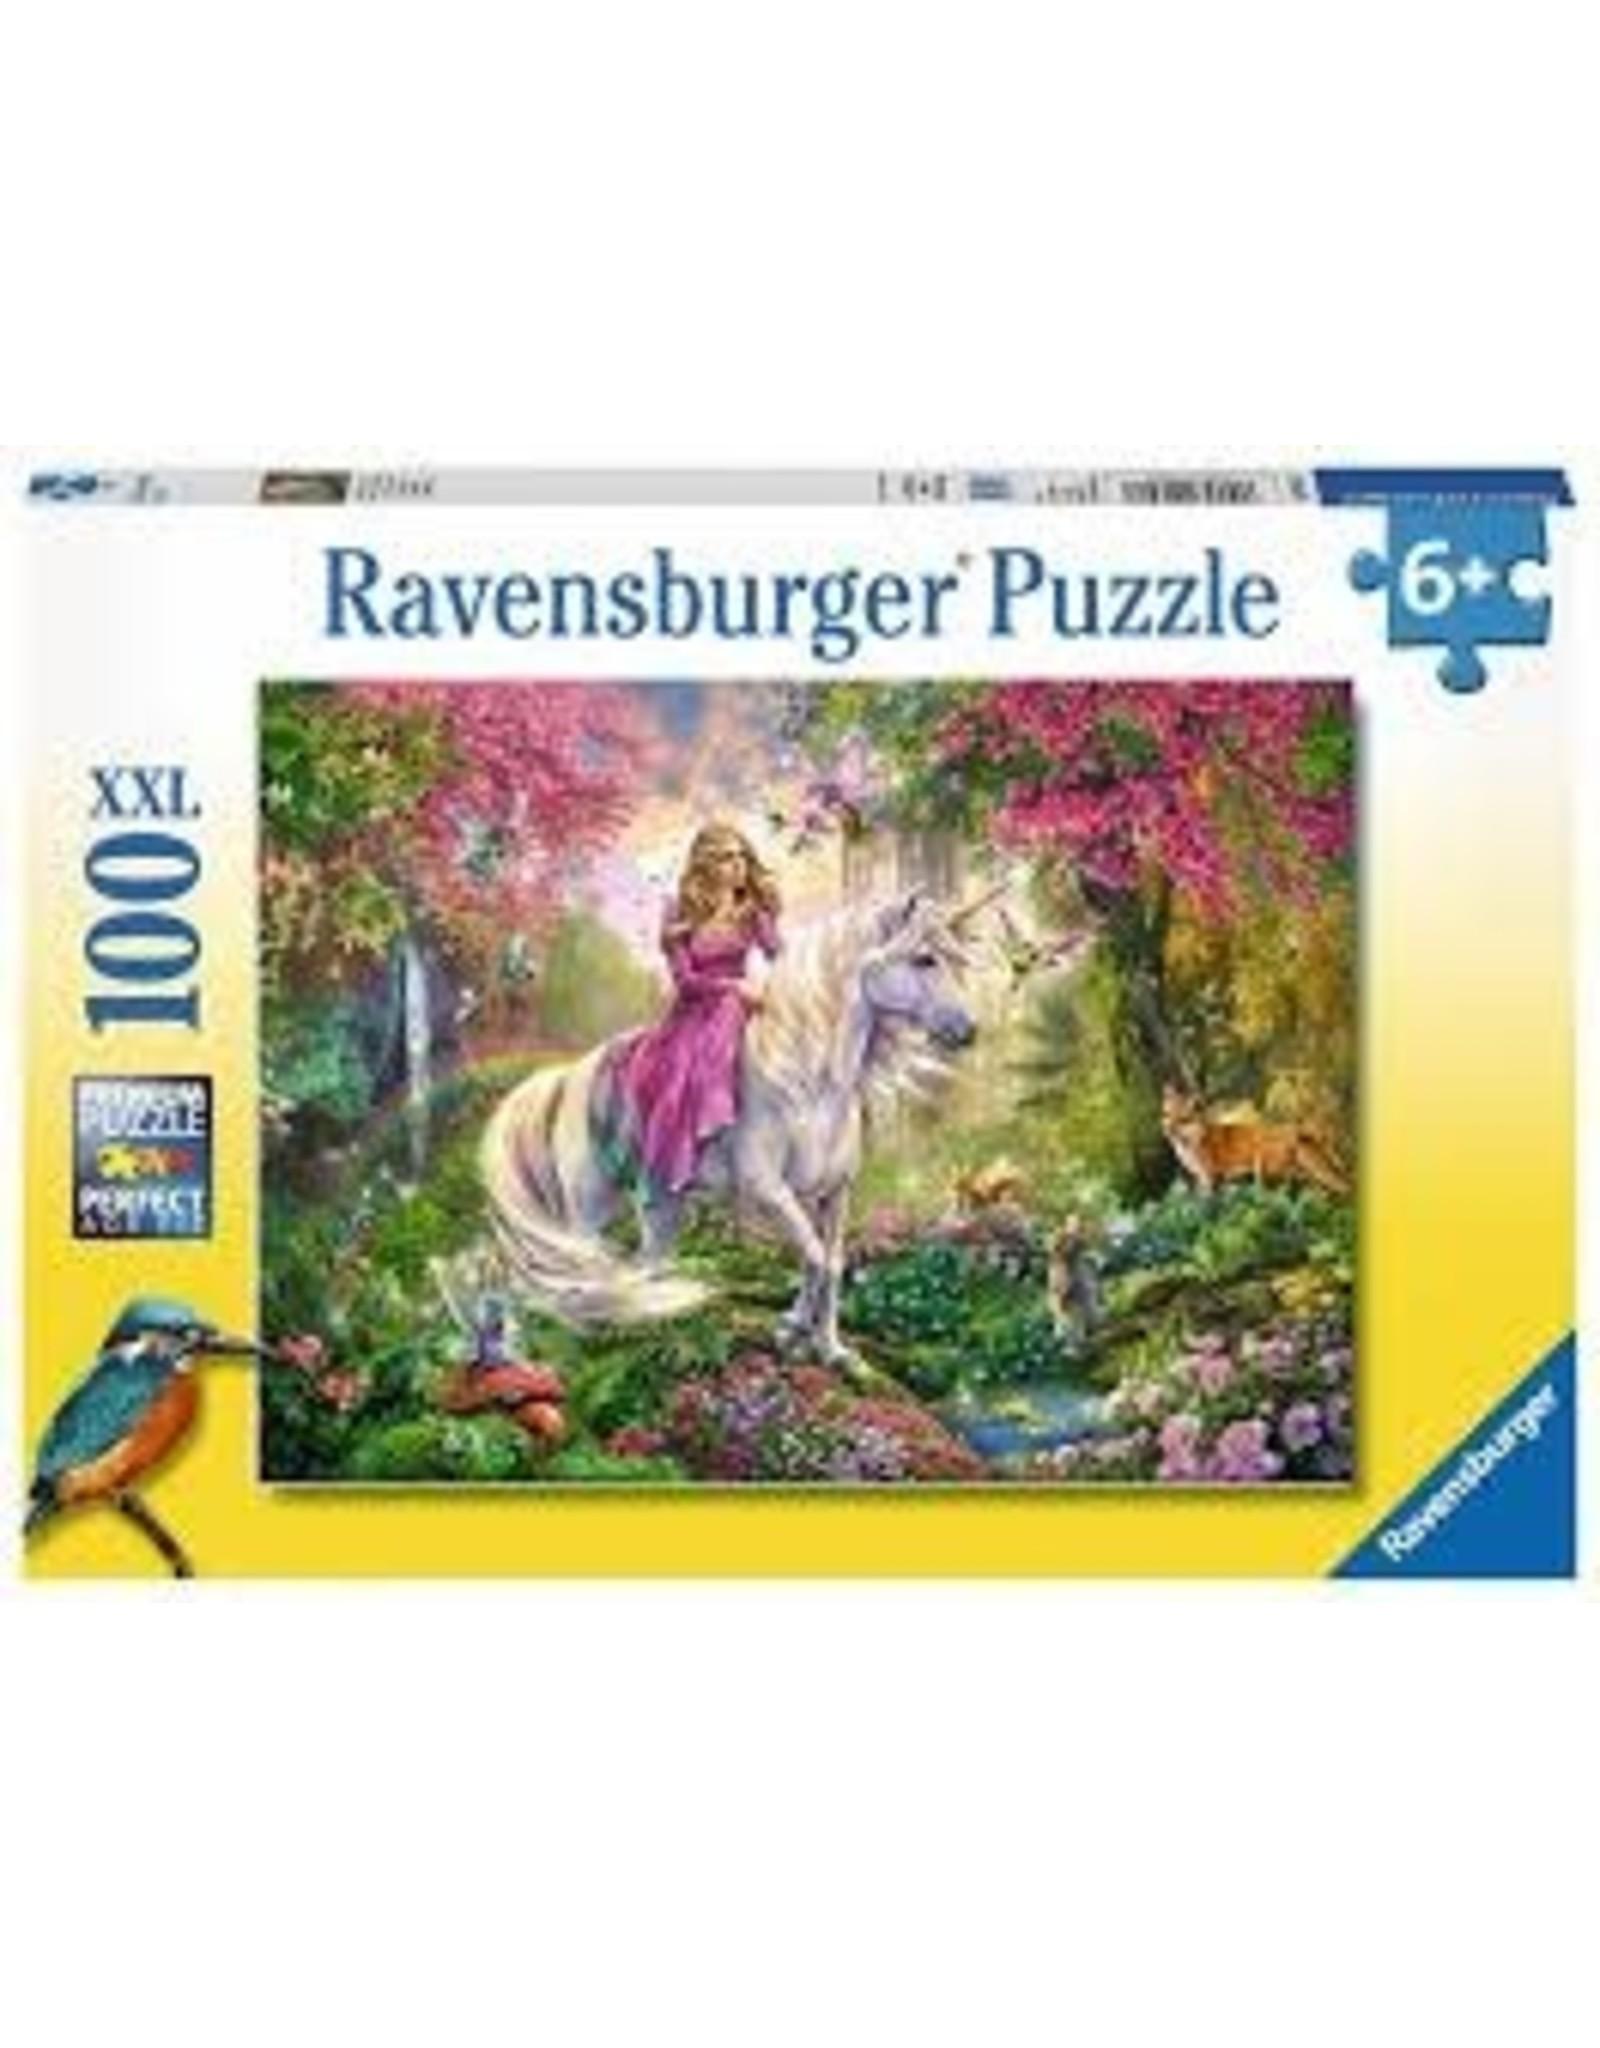 Ravensburger 100 pcs. Magical Ride Puzzle